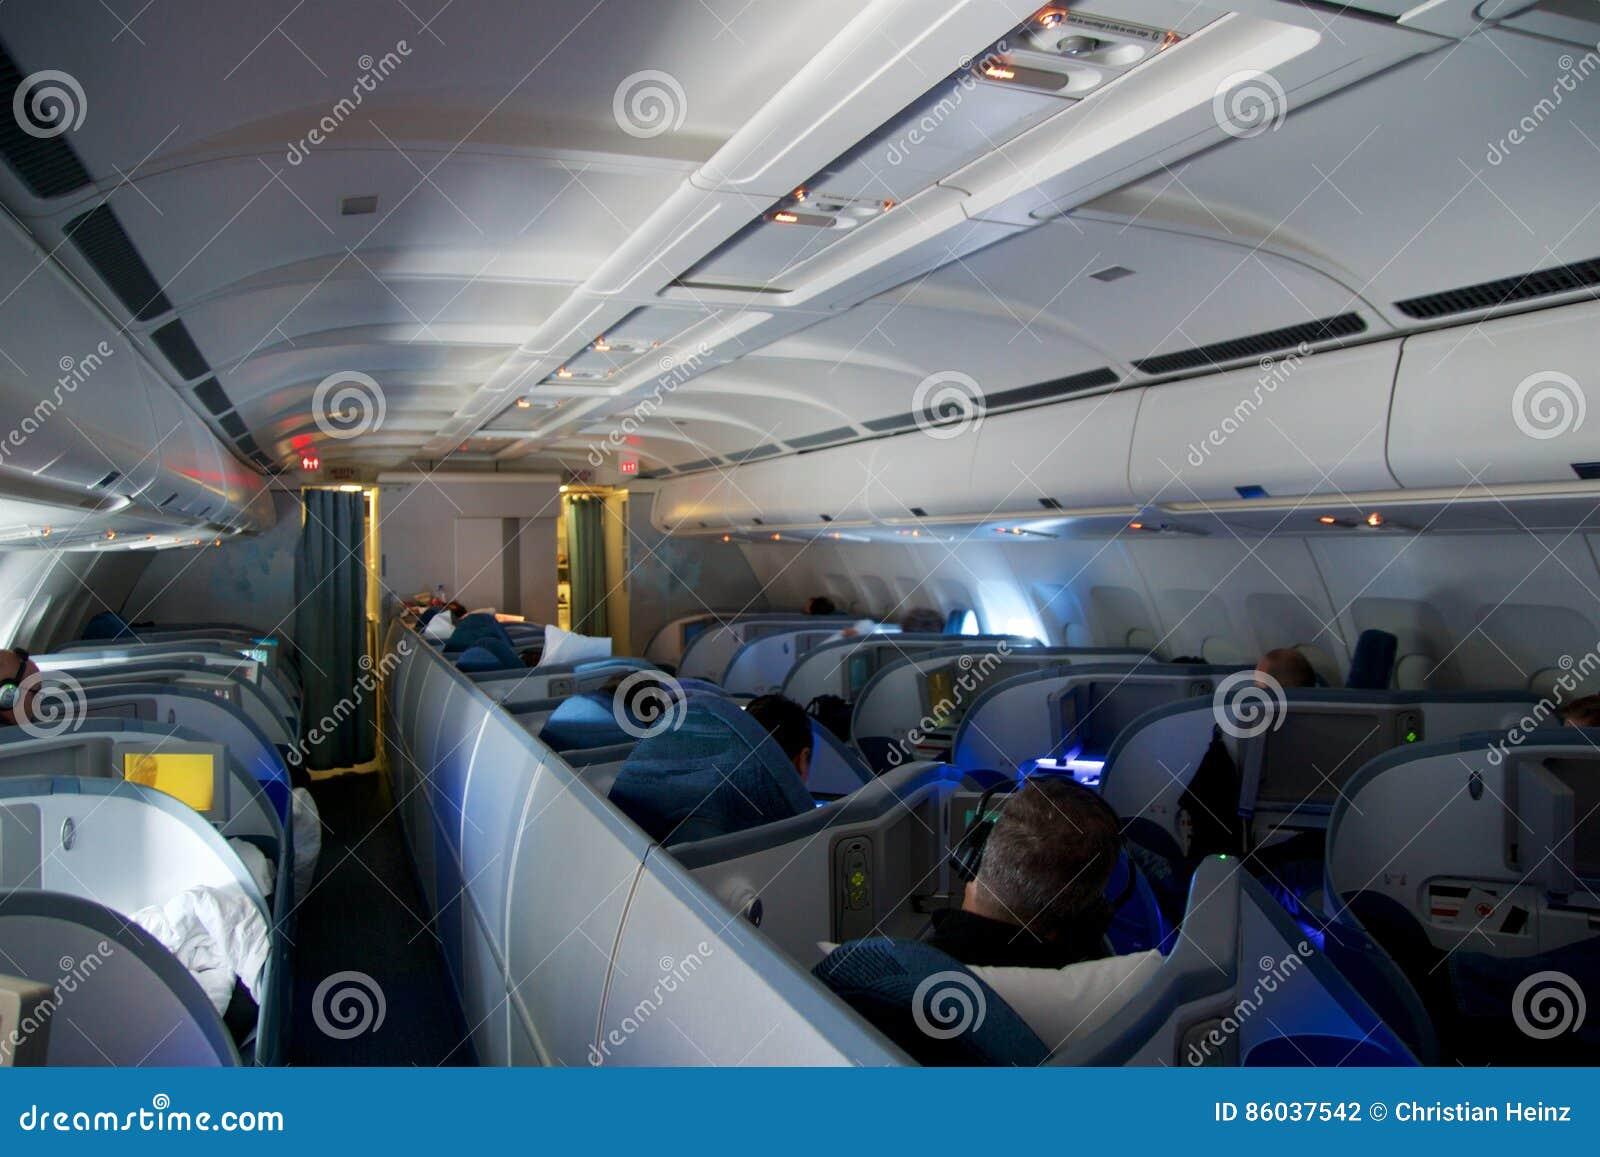 toronto canada 21 janvier 2017 siges de classe daffaires dair canada lintrieur dair canada airbus a330 sur mon chemin de munich vers toronto